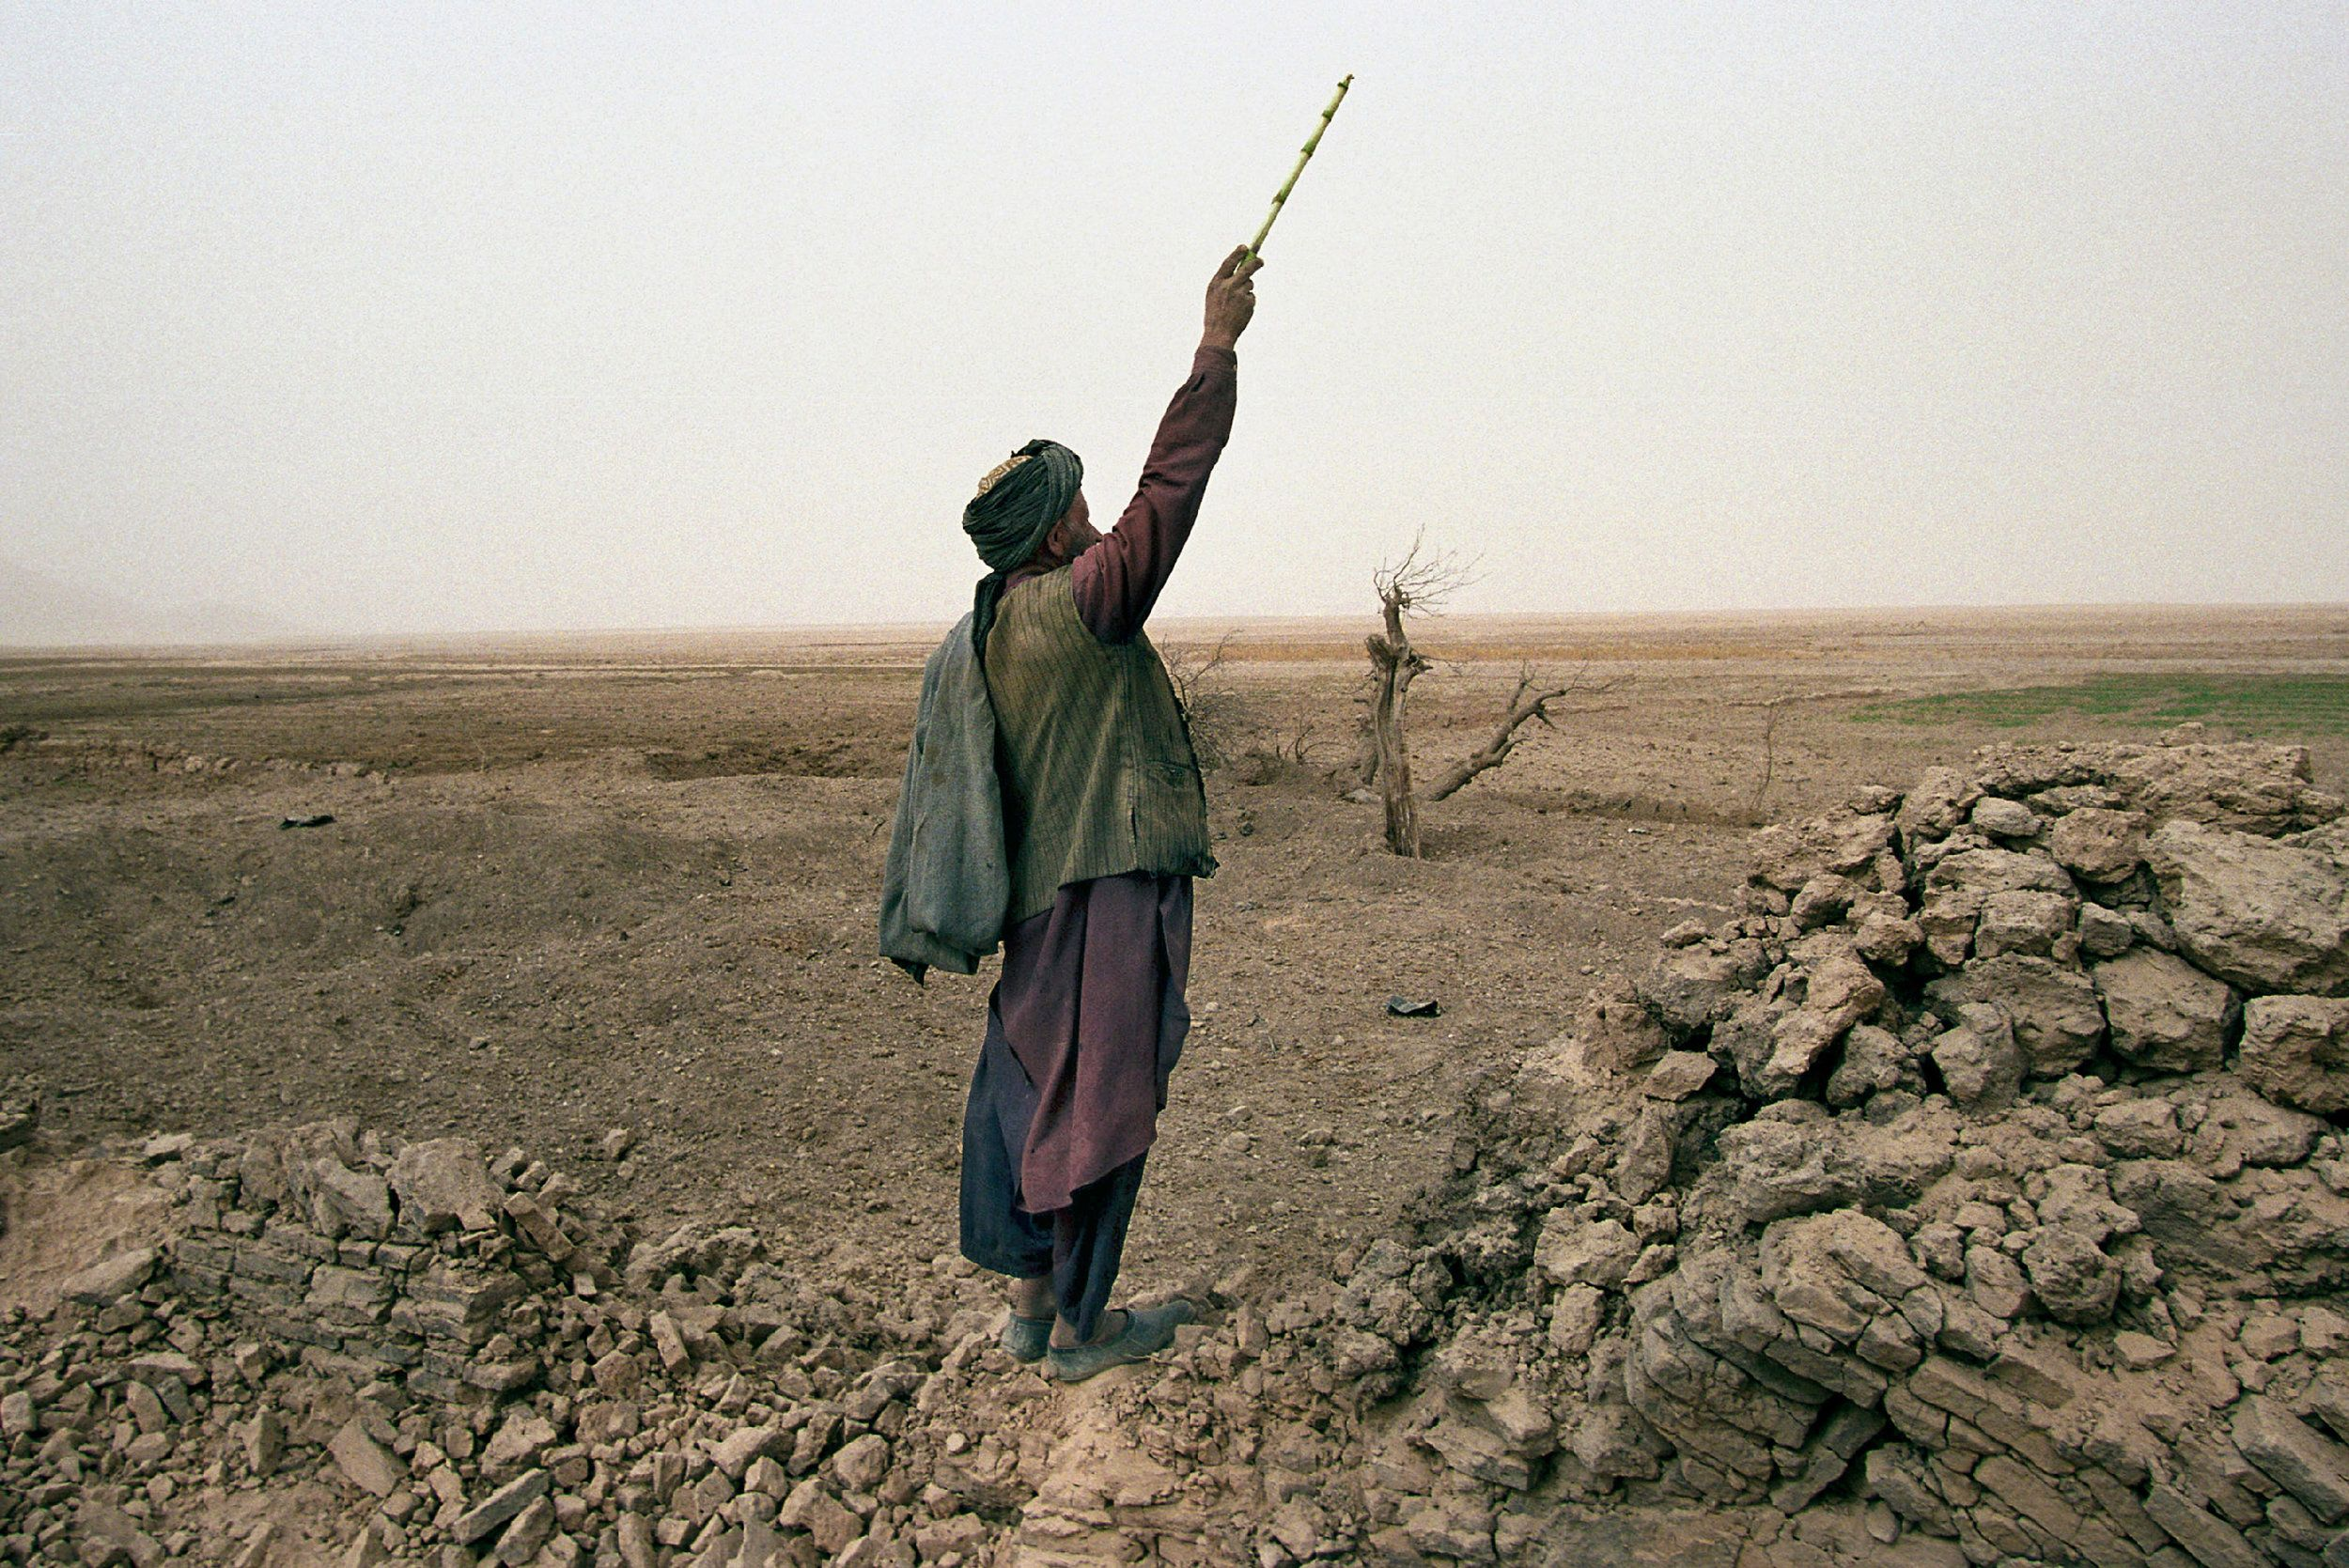 An Afghan shepherd calls to his children in November 2001.